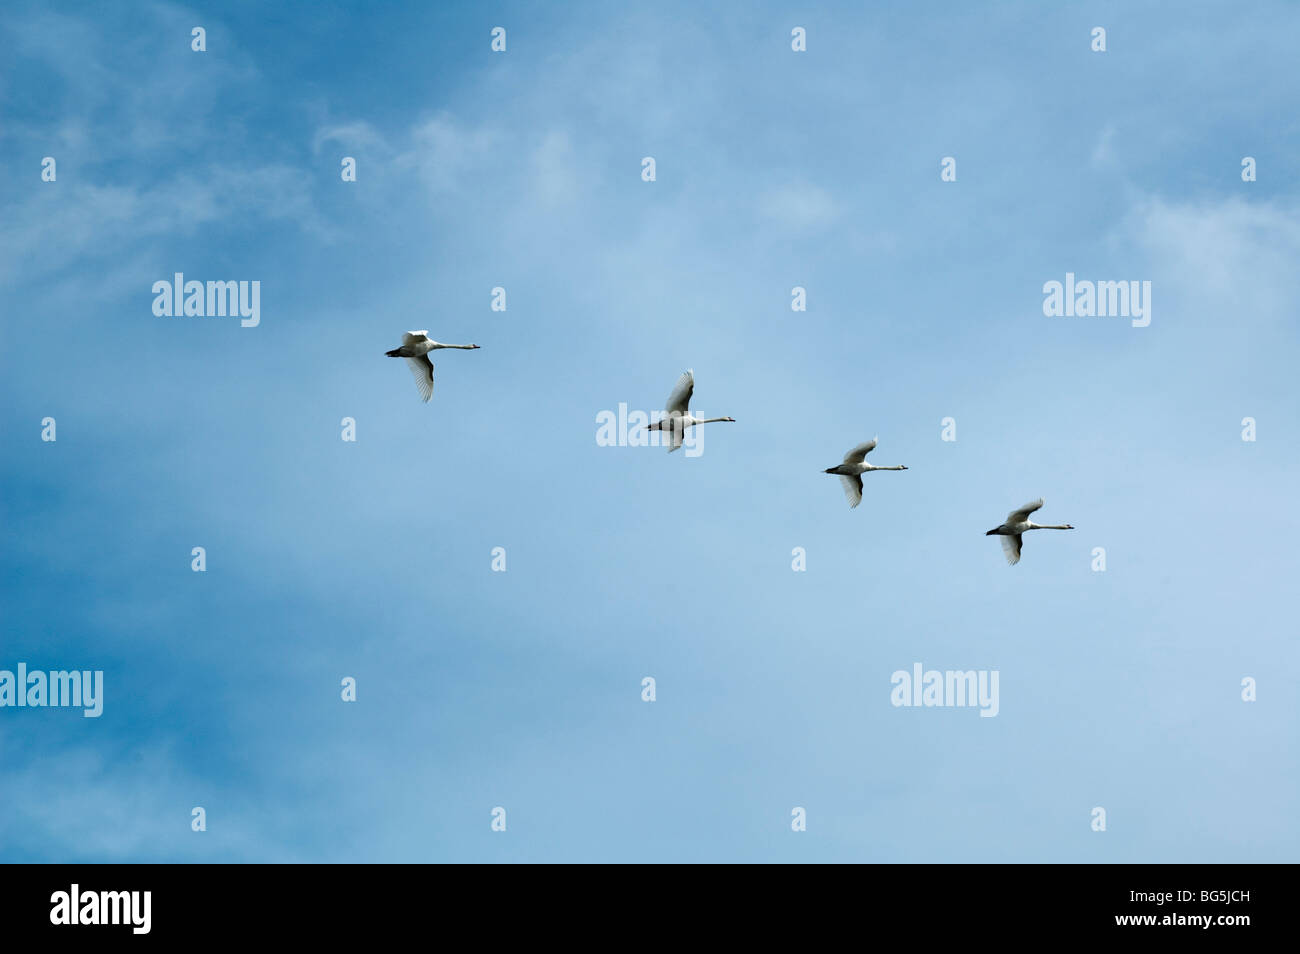 fliegende Schwäne am Himmel, Insel Usedom, Mecklenburg-Vorpommern, Deutschland | flying swans, Isle of Usedom, Mecklenburg Stock Photo